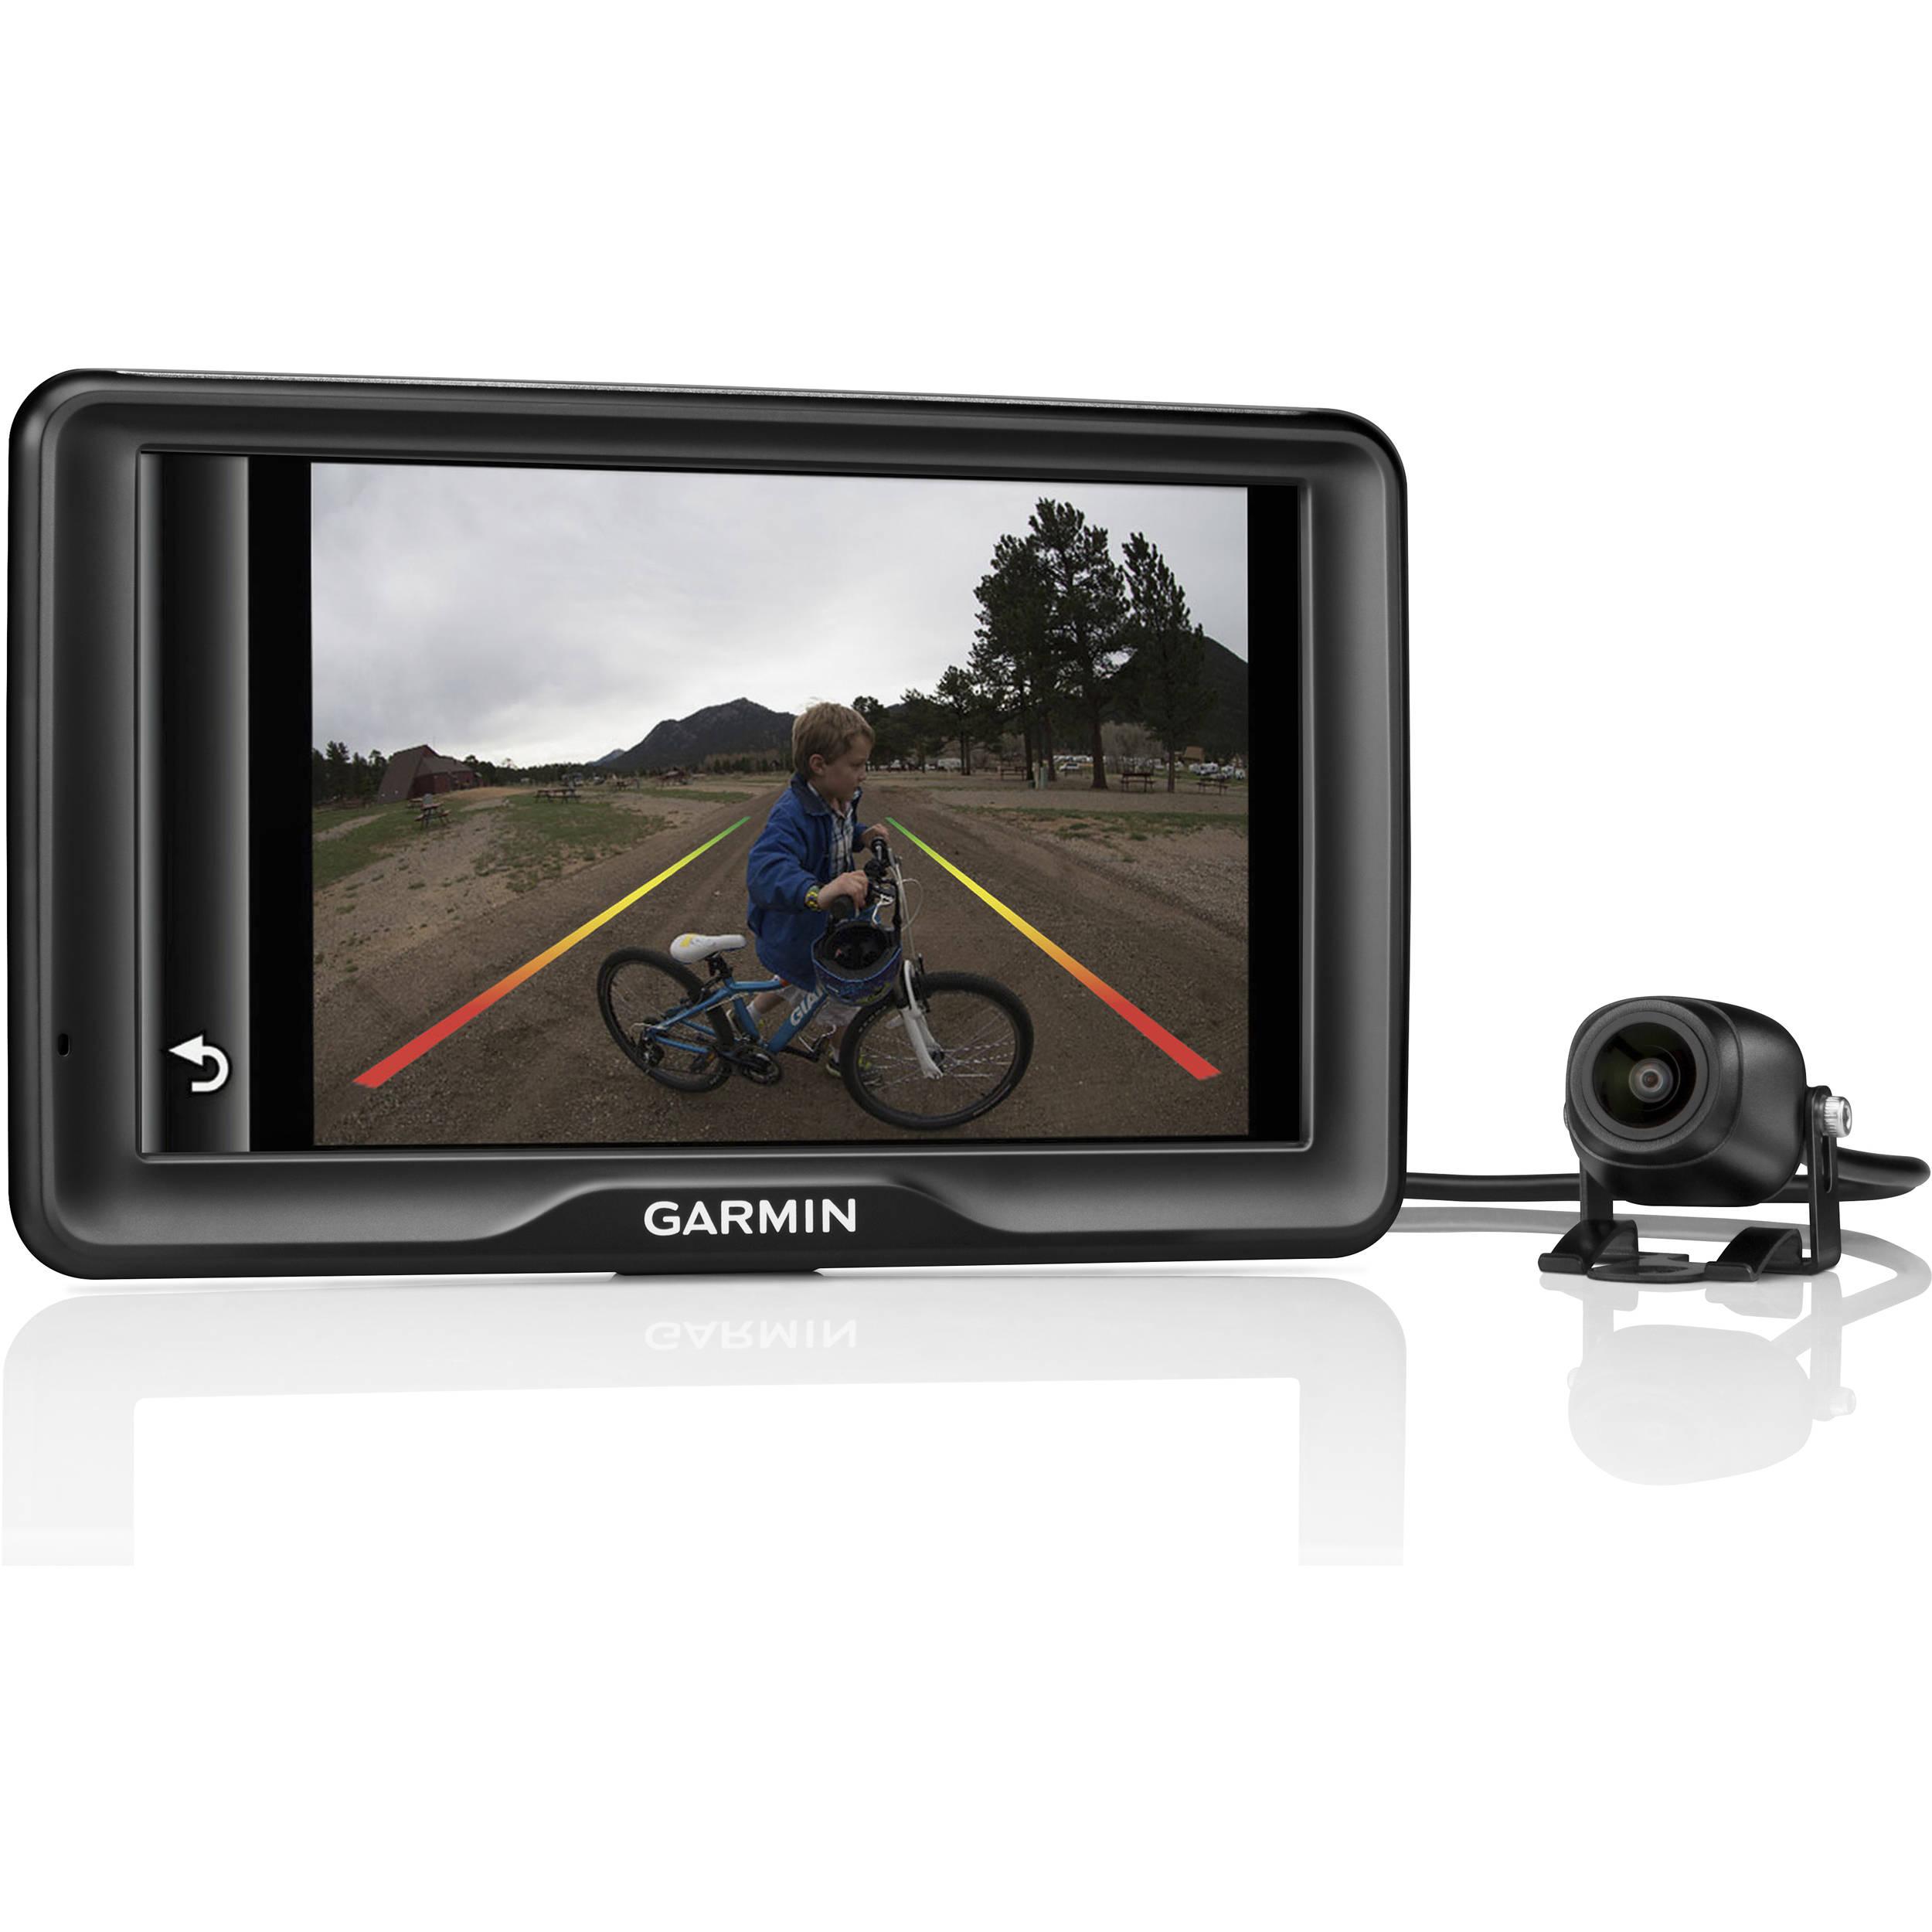 Rv Backup Camera >> Garmin RV 760LMT with Wireless Backup Camera 010-01168-02 B&H